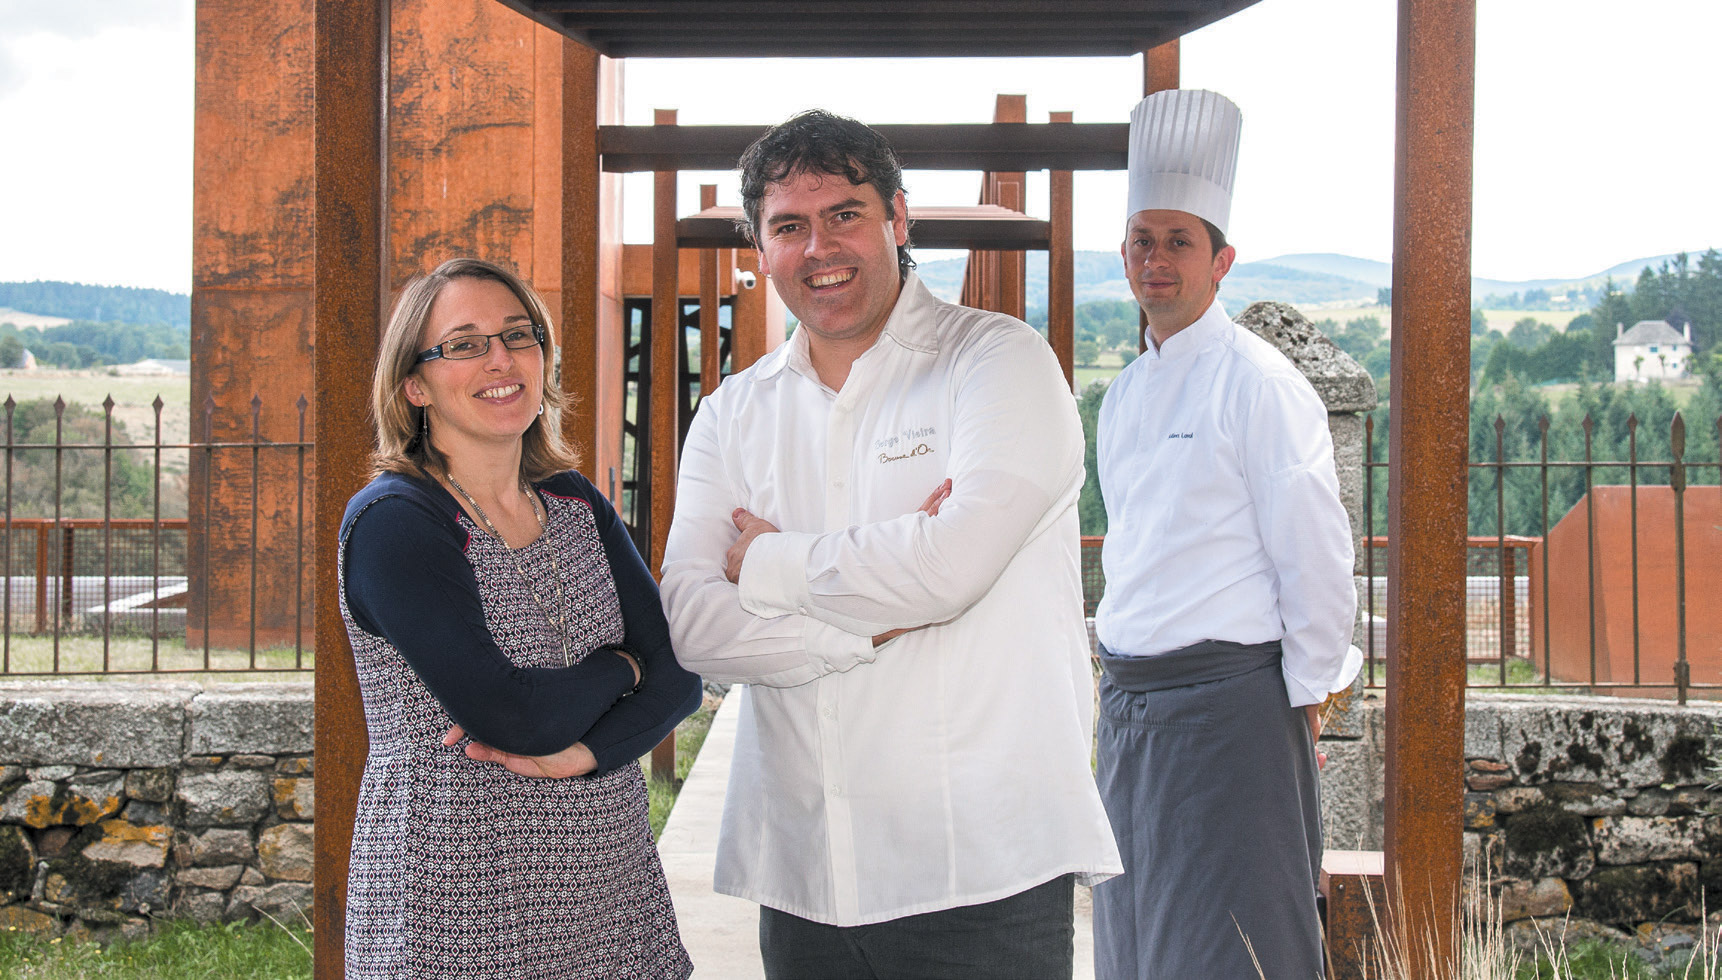 Restaurant Restaurant Serge Vieira - Serge Vieira